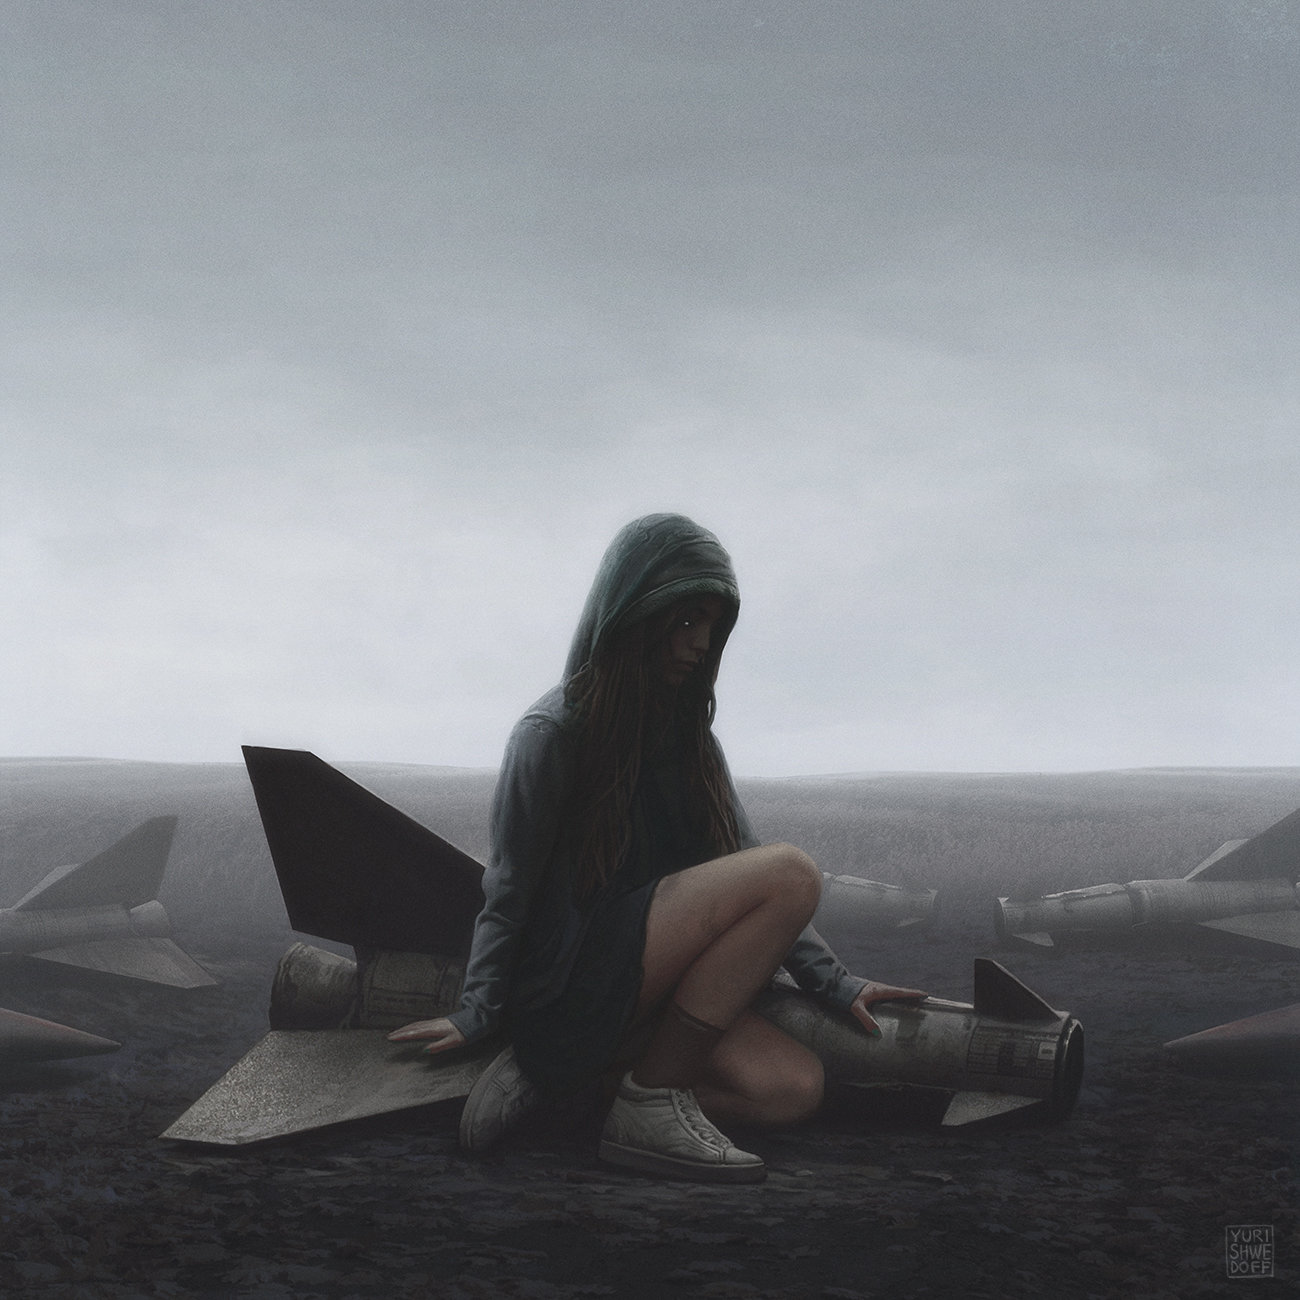 yuri-shwedoff-fallen-birds-internet.jpg